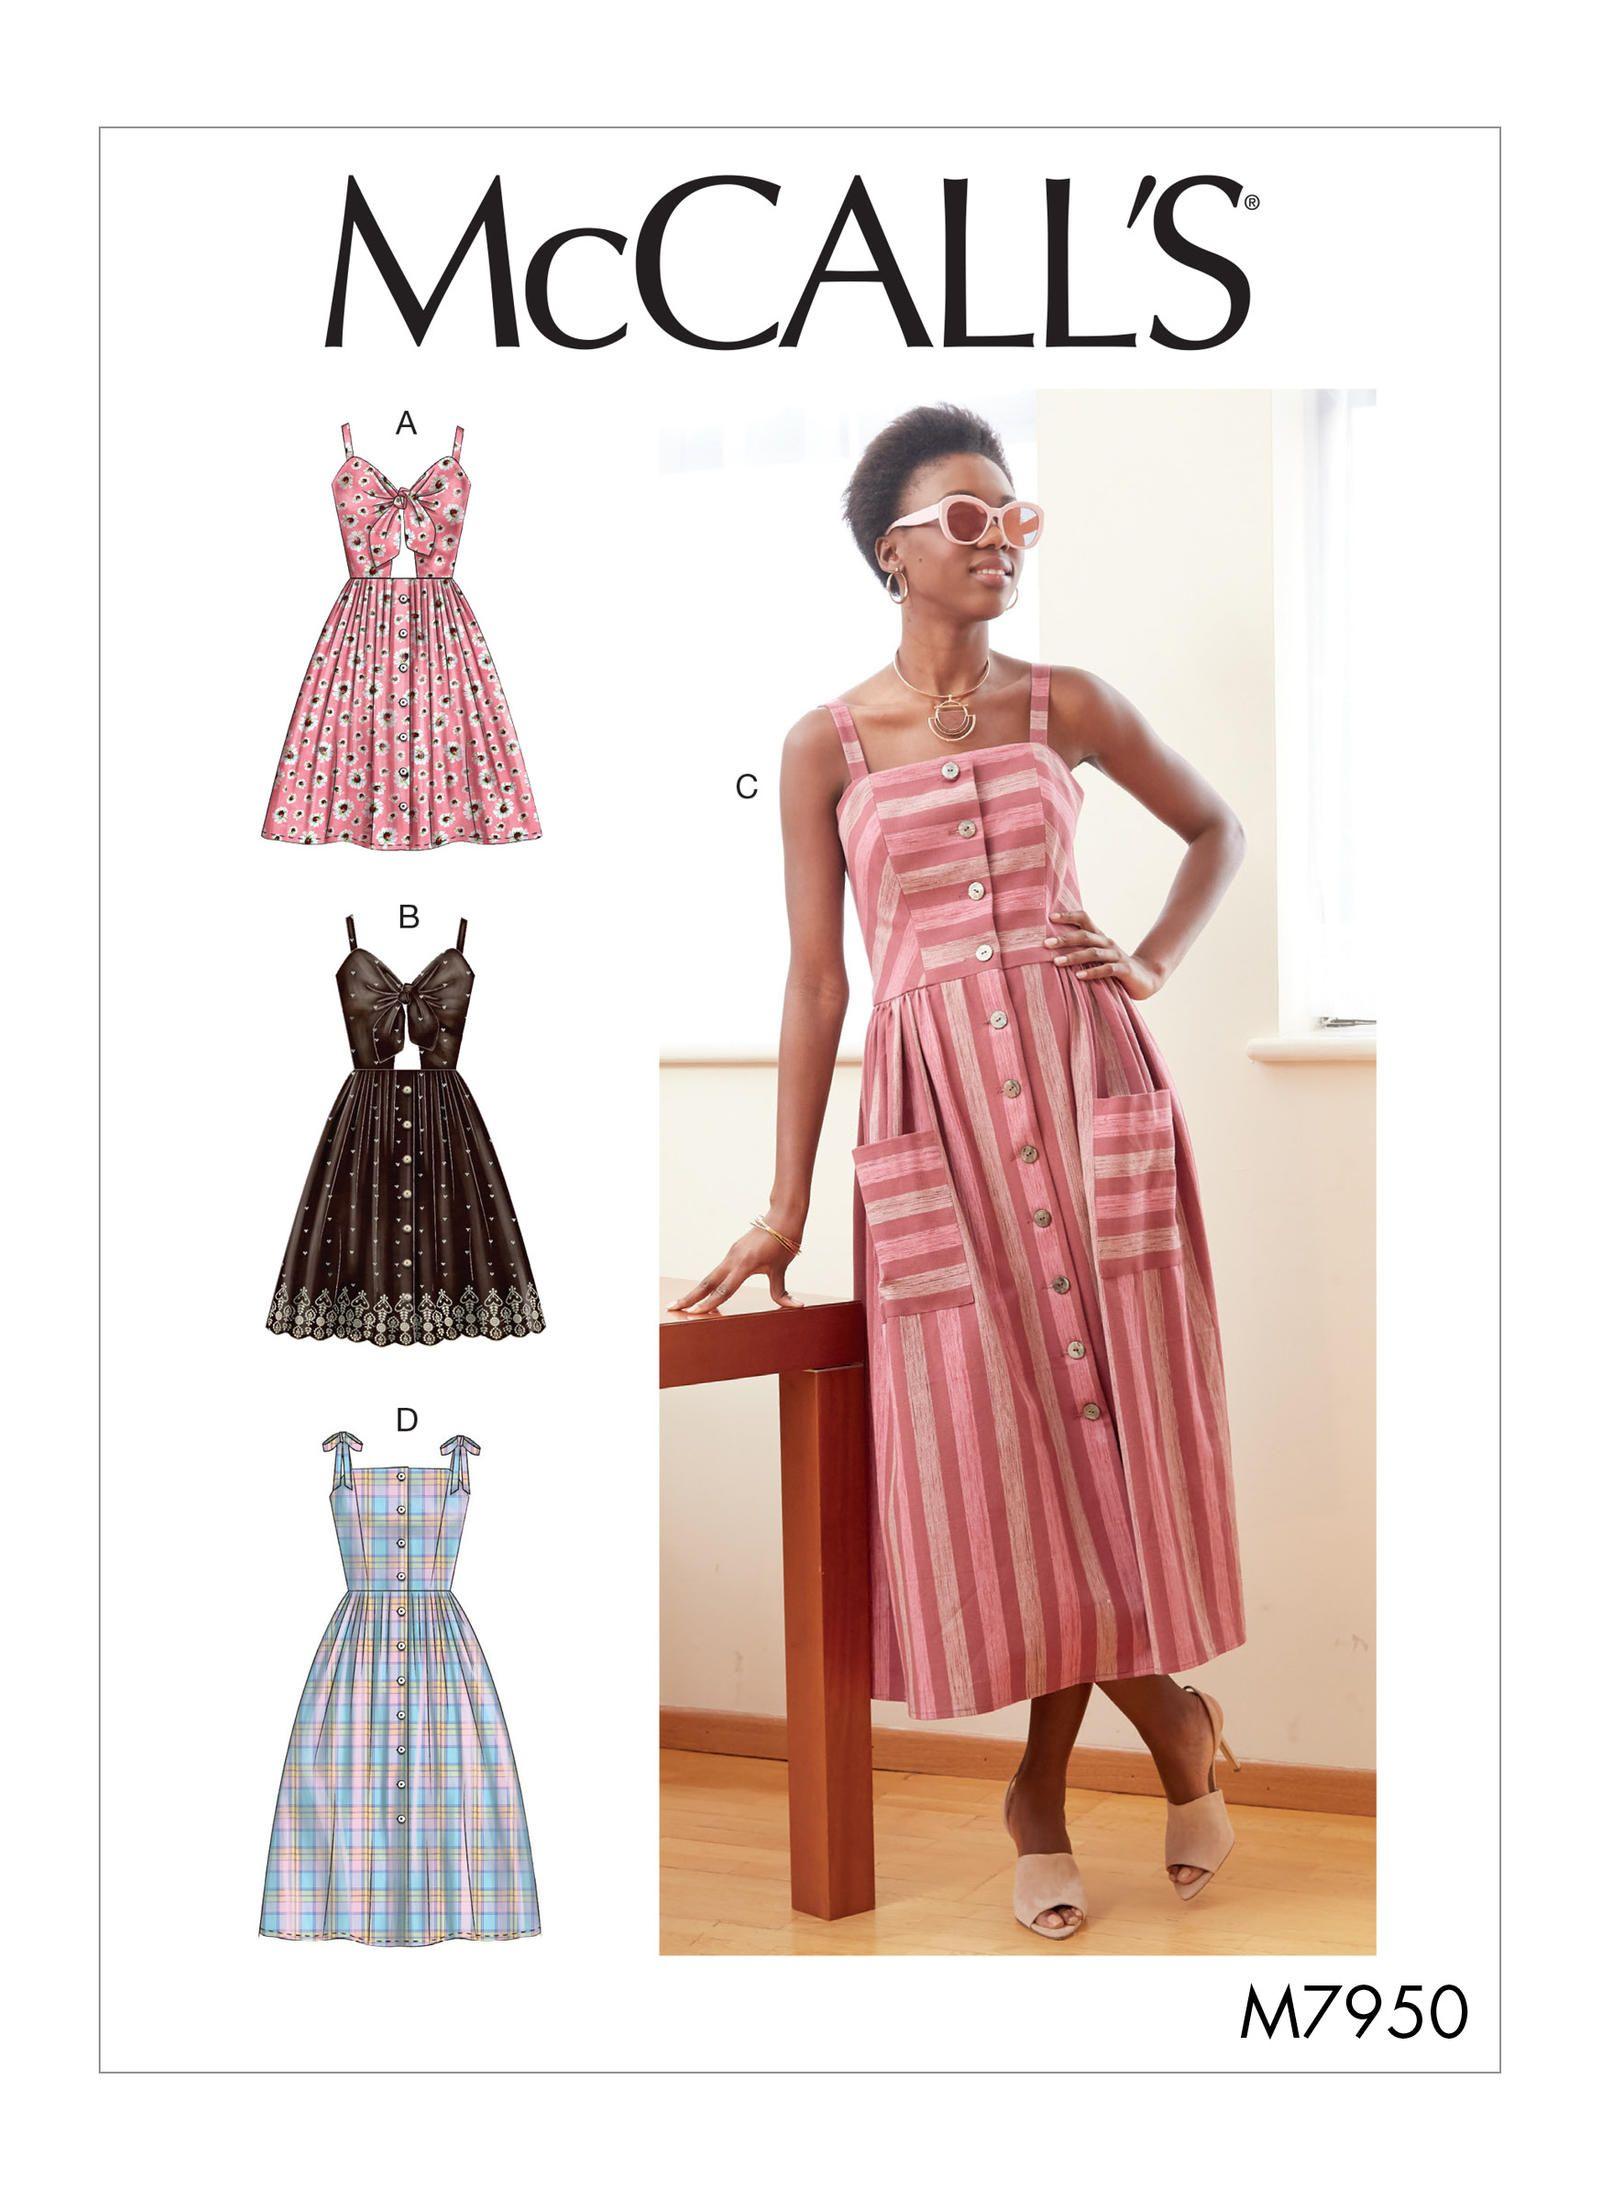 M7950 Misses Dresses Sewing Pattern Mccall S Patterns Summer Dress Sewing Patterns Dress Sewing Patterns Blouse Diy [ 2200 x 1600 Pixel ]